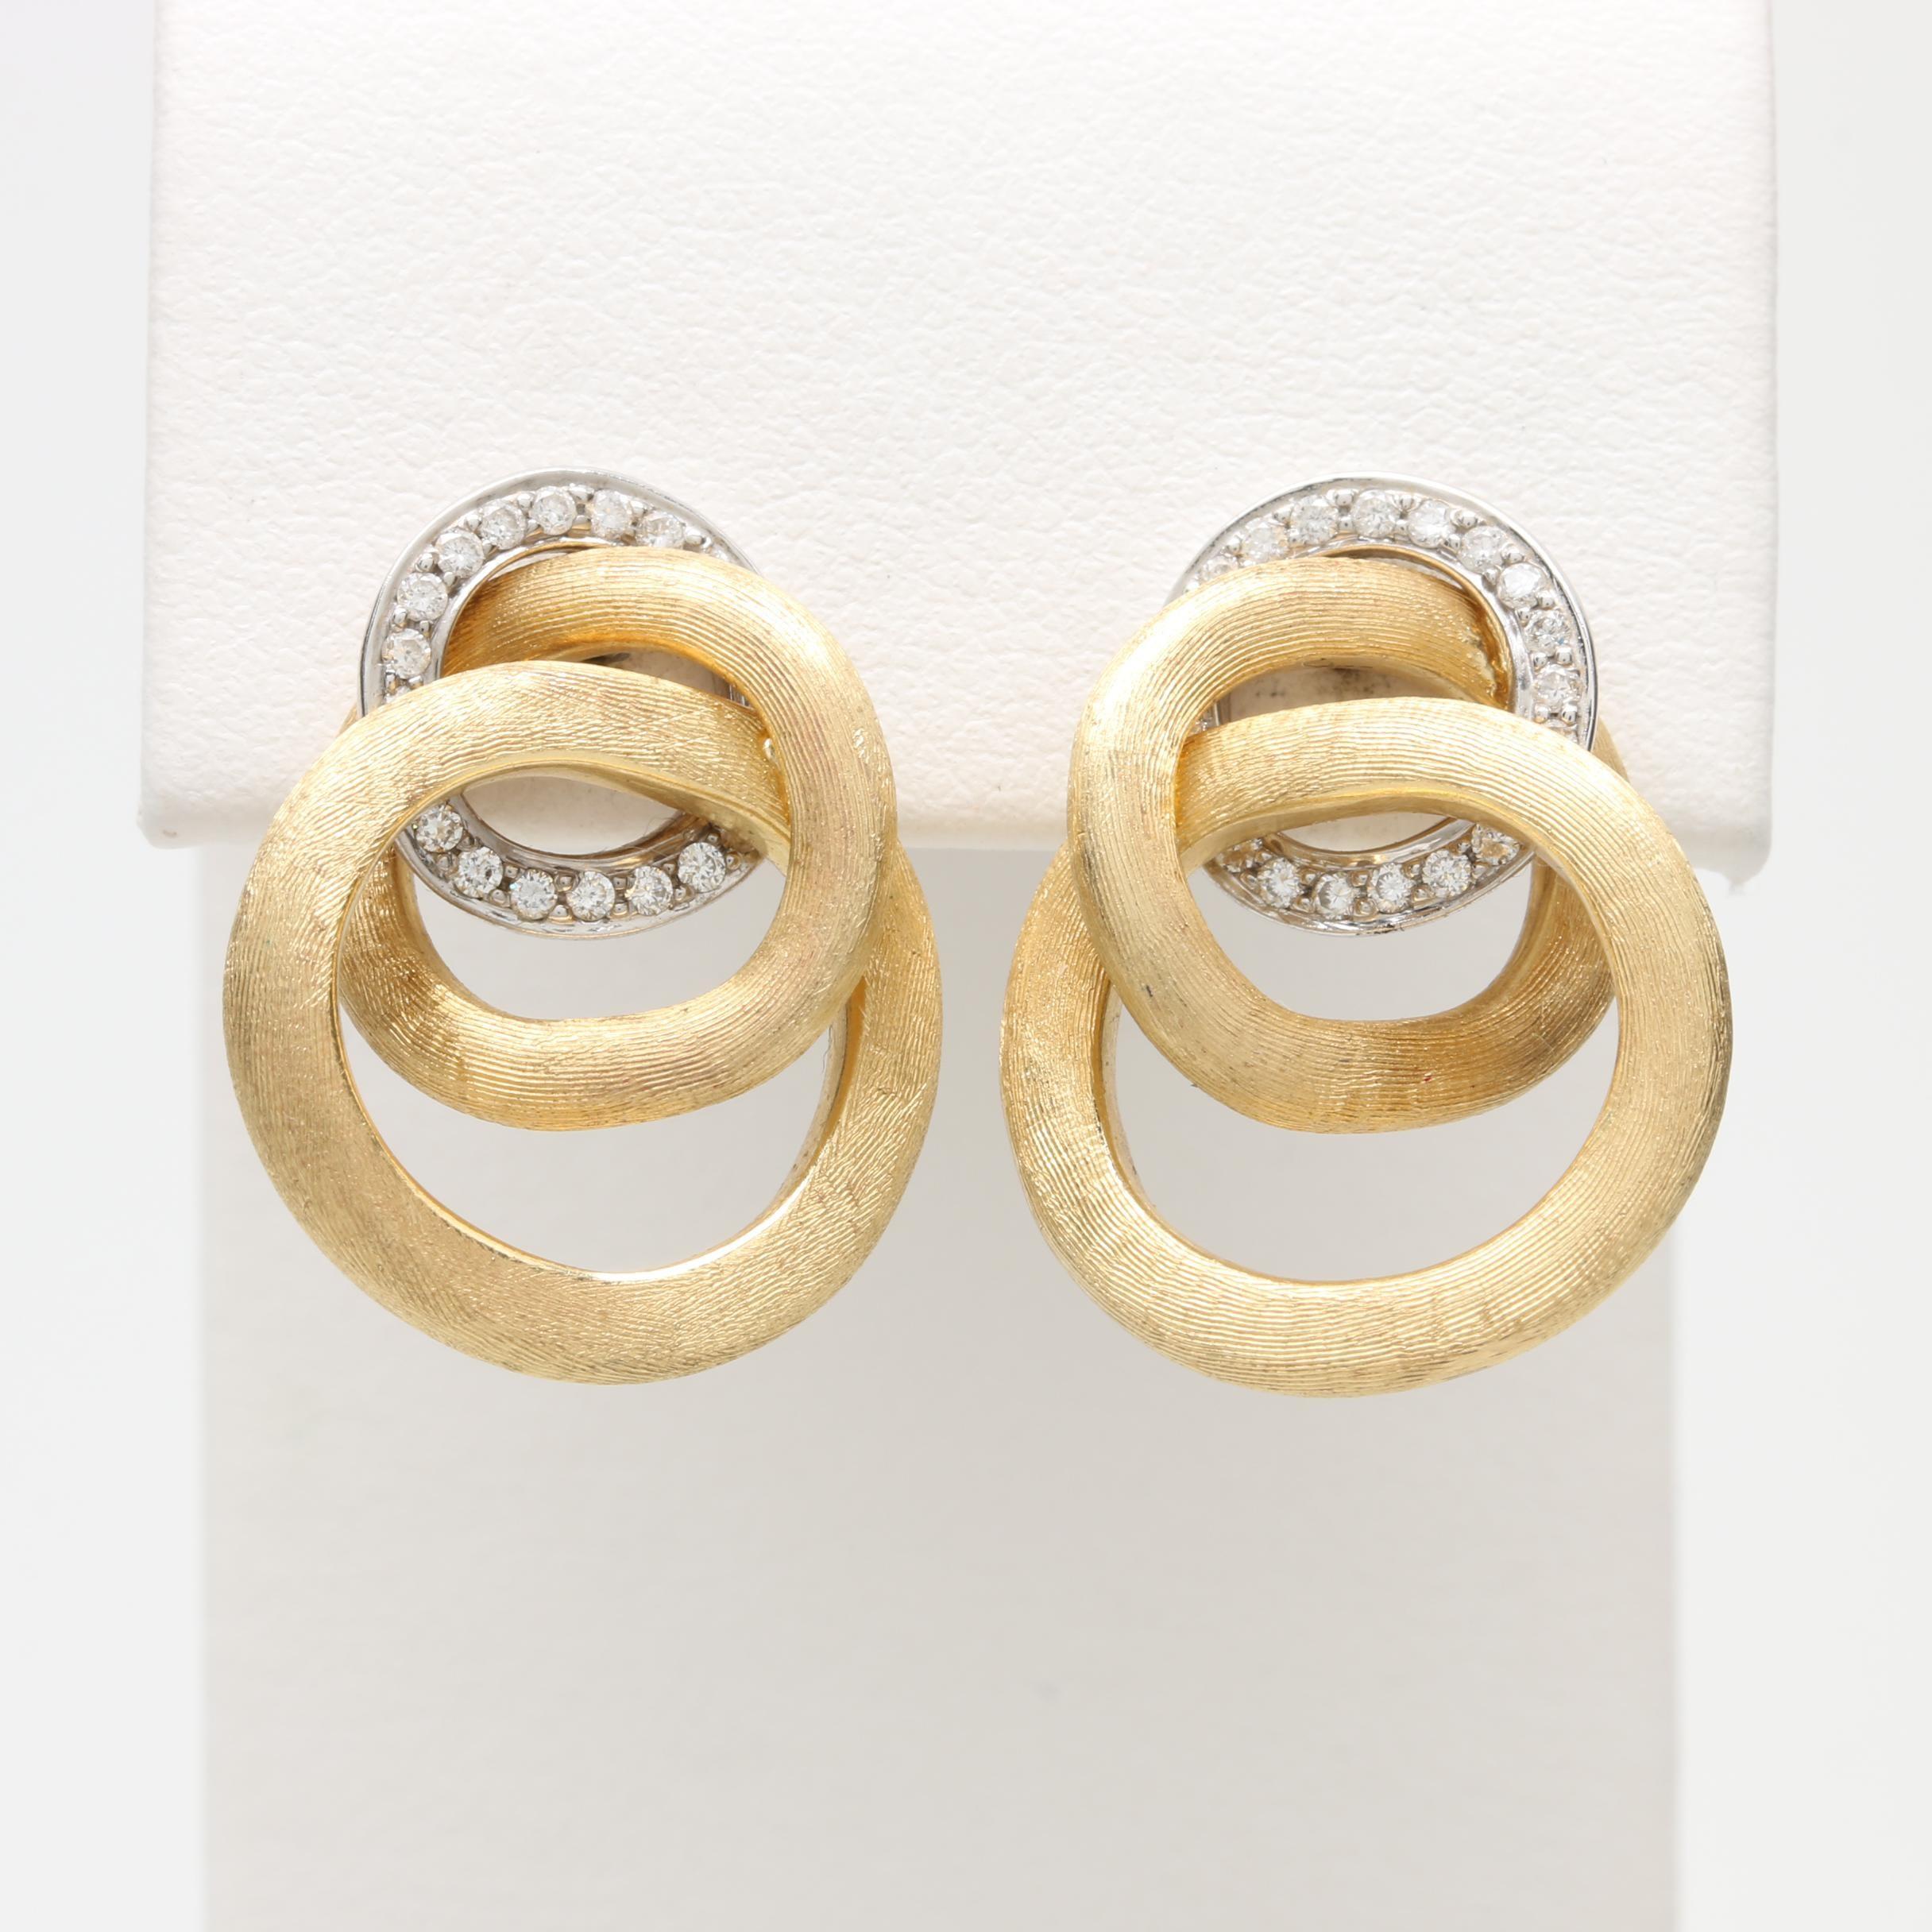 Marco Bicego Italian Made 18K Yellow and White Gold Diamond Earrings